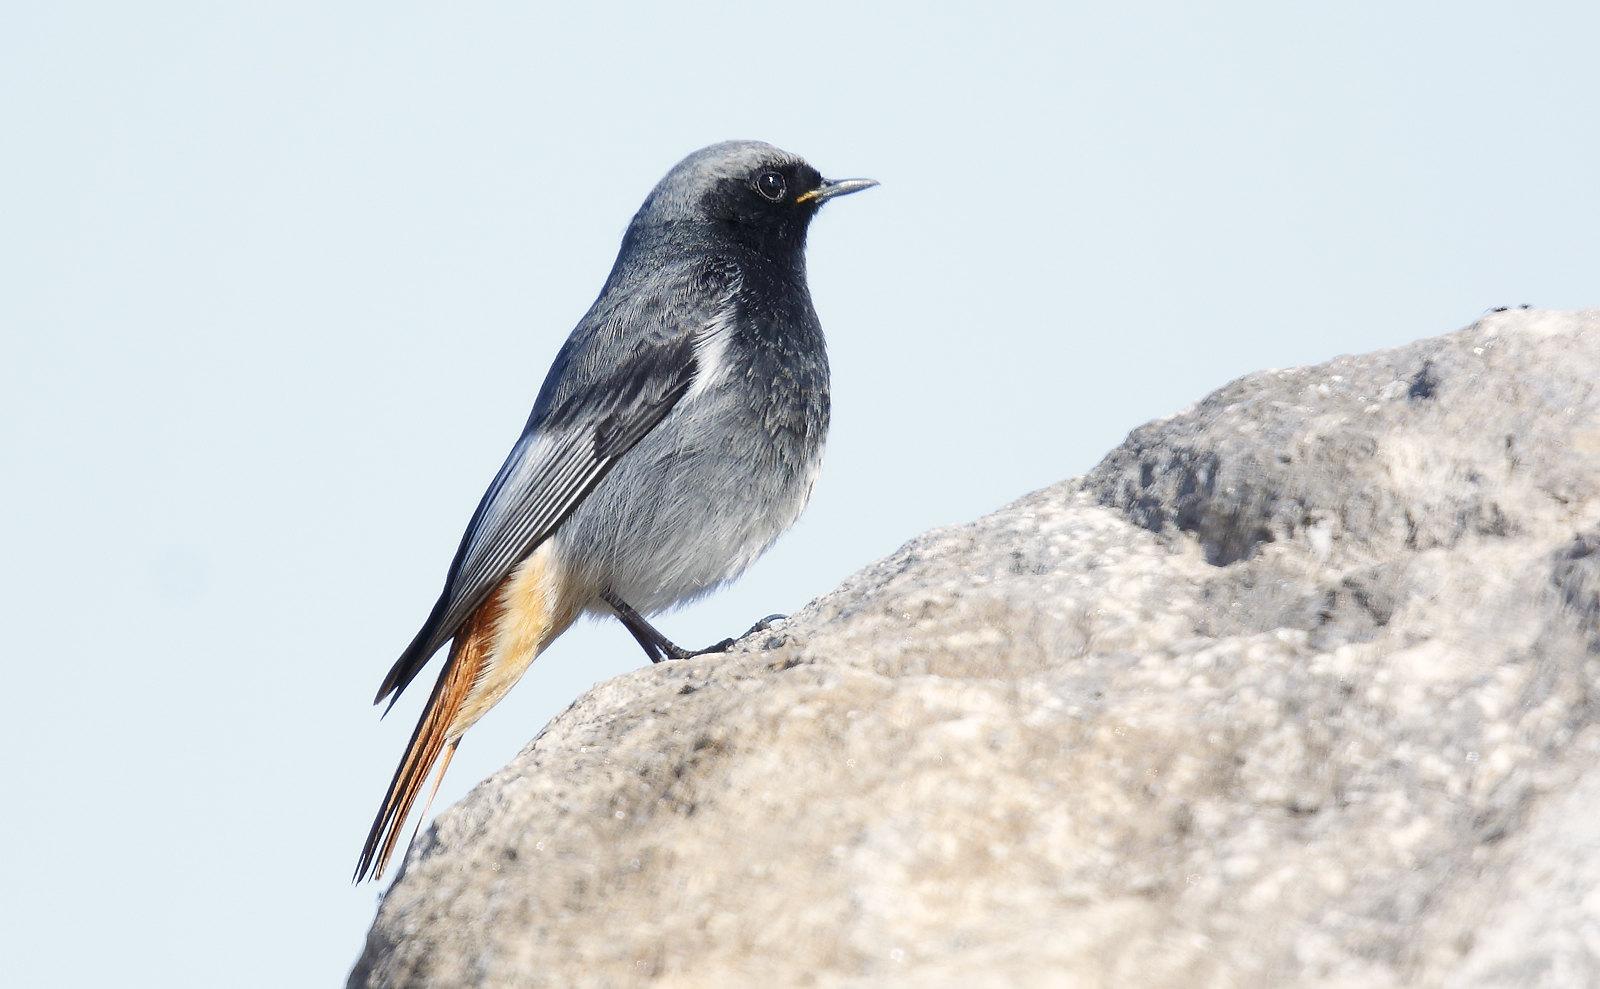 Male Black Redstart